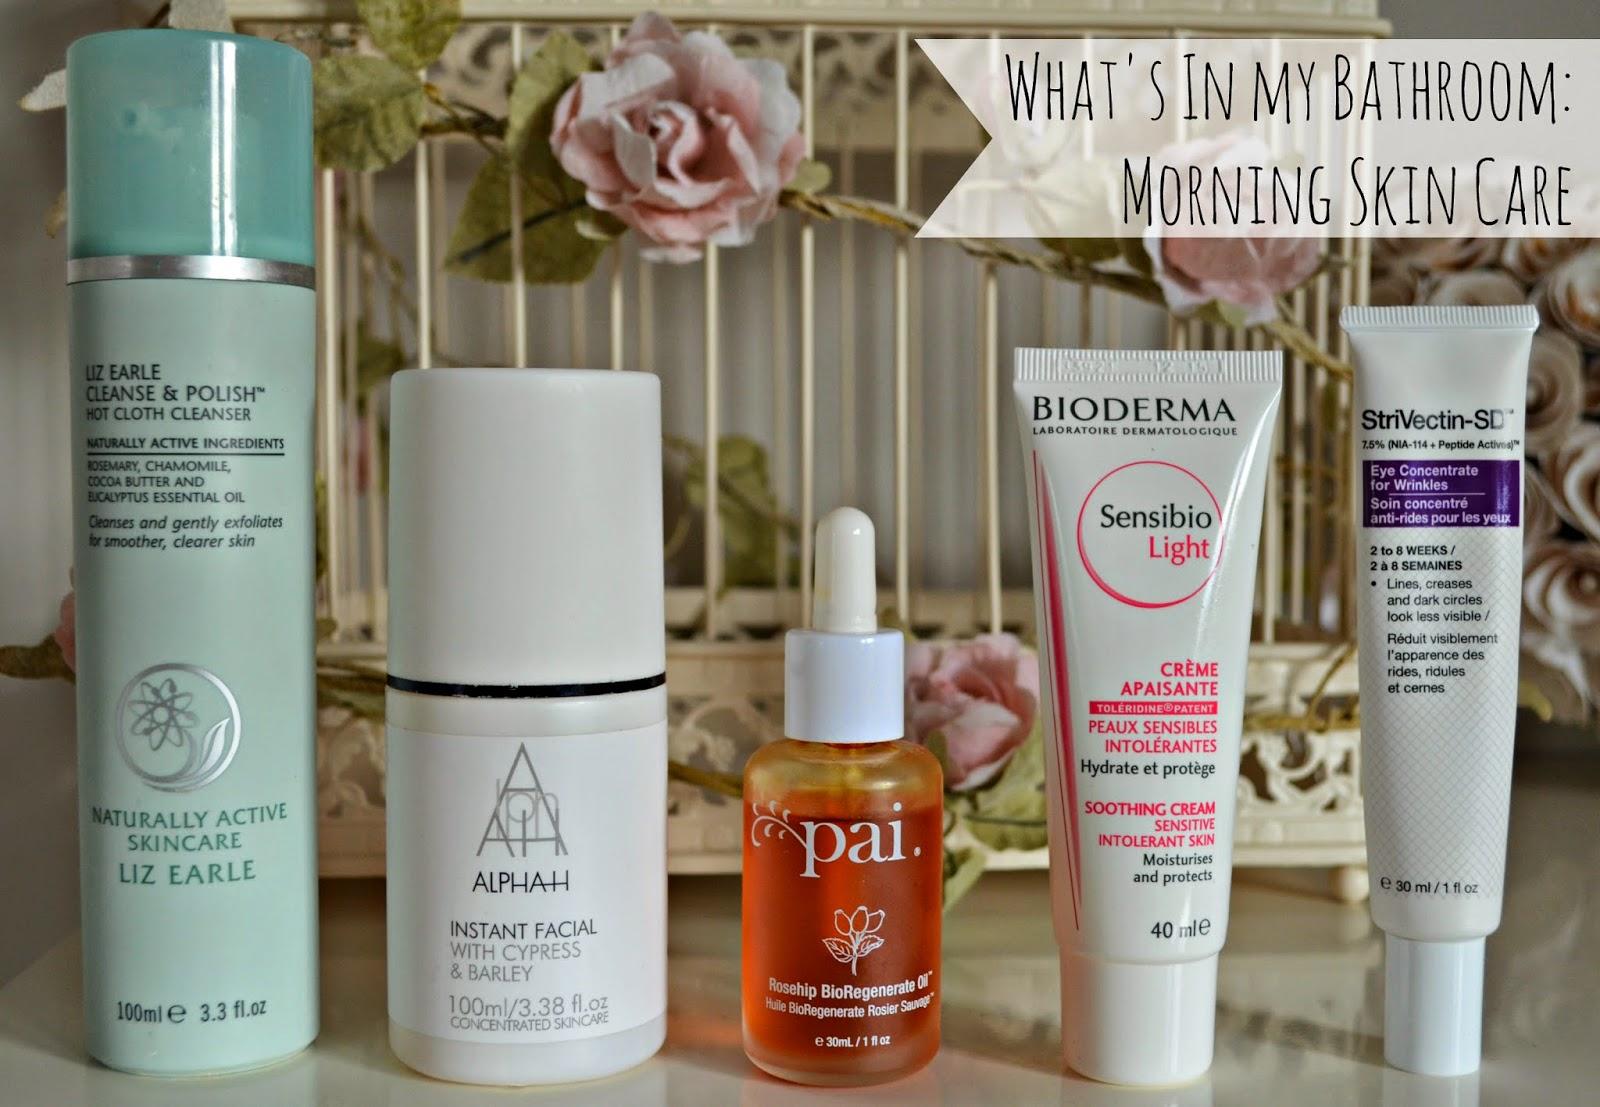 Liz Earl Cleanse and polish, Alpha H instant facial, Pai rosehip, bioderma sensibio light, StriVectin SD